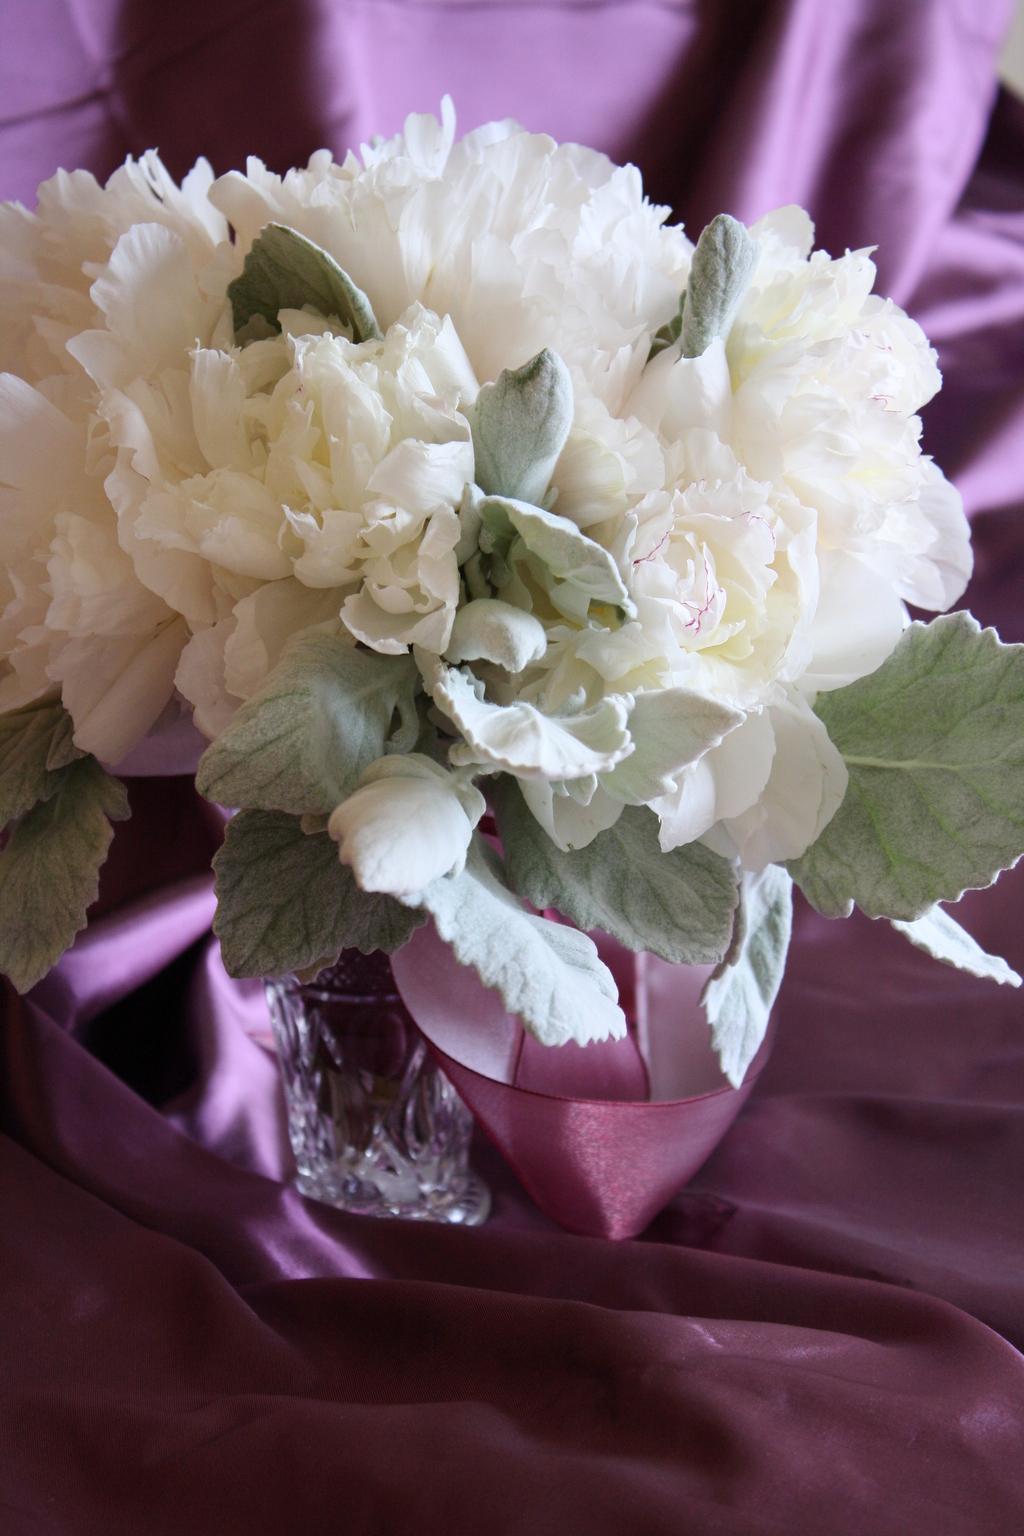 10-white-wedding-flowers-we-love-bowl-of-cream-peonies-wedding-centerpiece.full